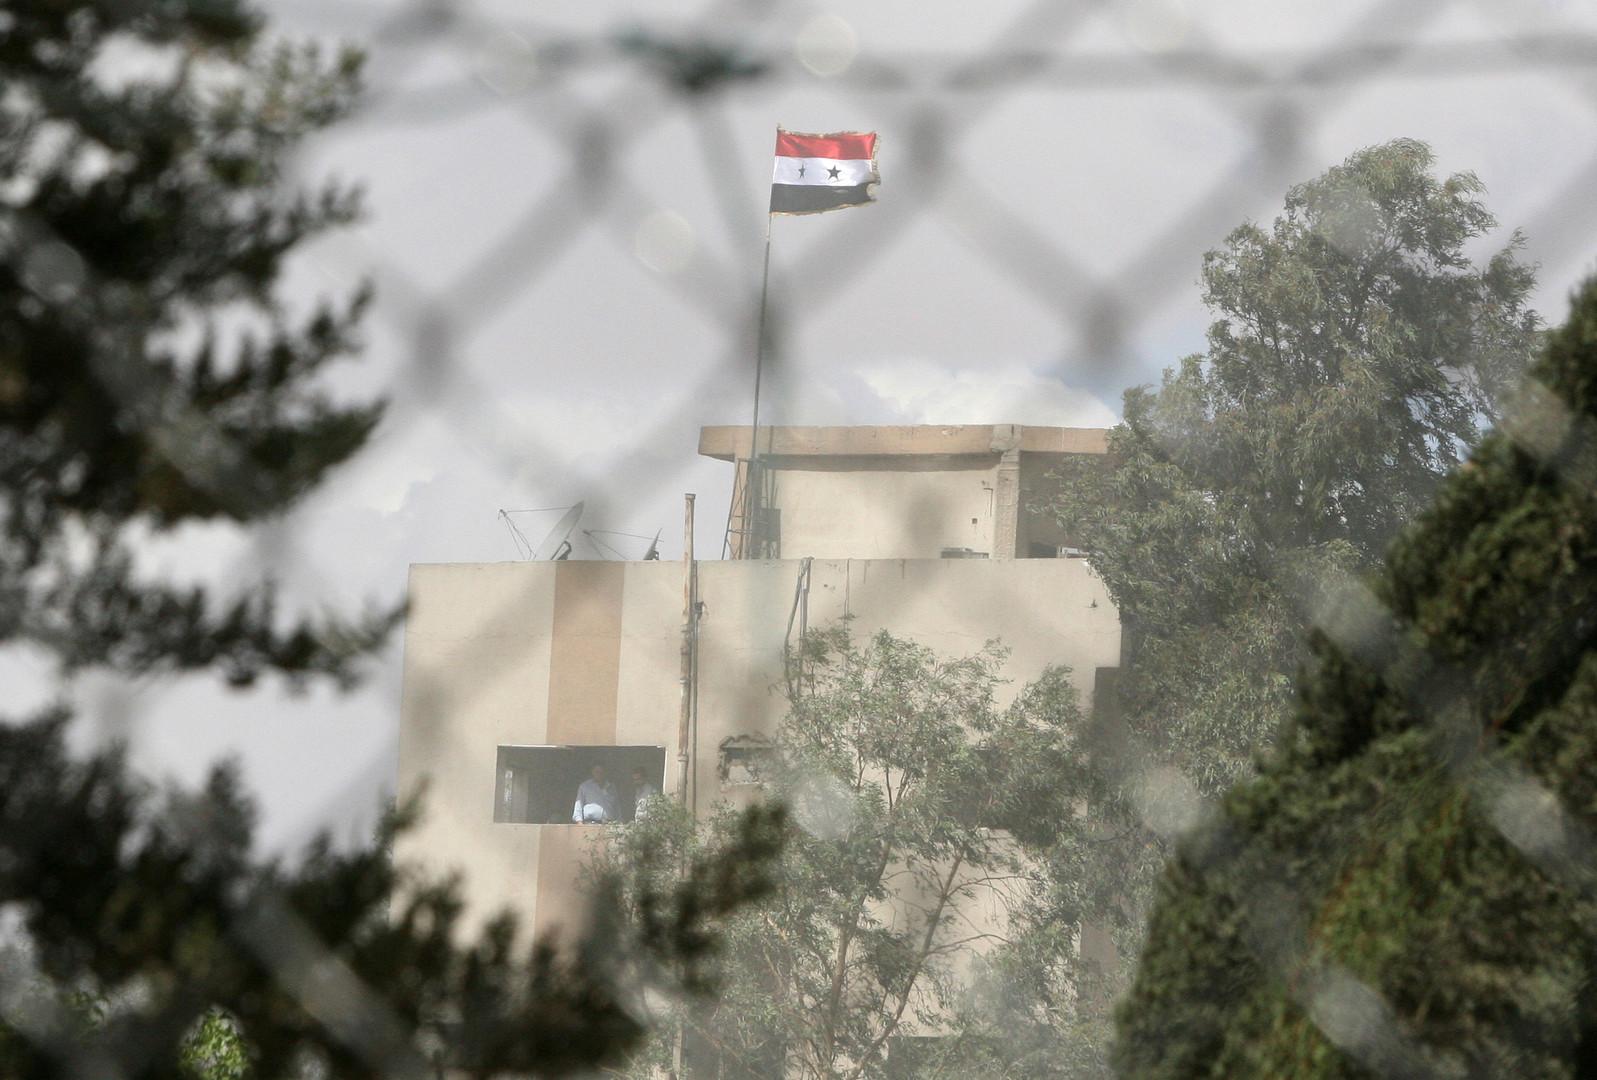 إيران تنفي قصف إسرائيل أهدافا تابعة لها في سوريا وتهدد تل أبيب وواشنطن